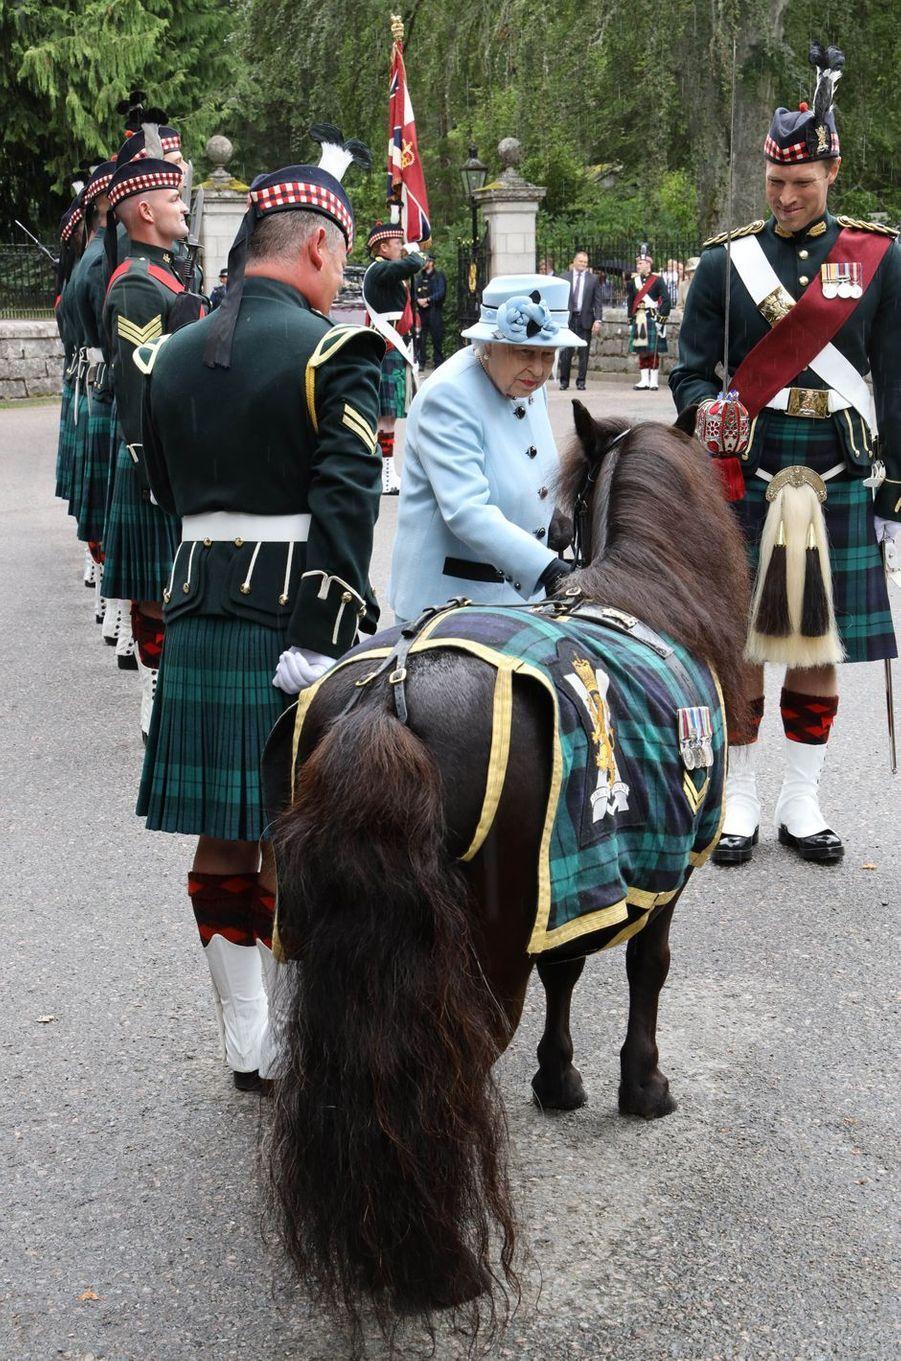 La reine Elizabeth II à Balmoral, le 6 août 2019